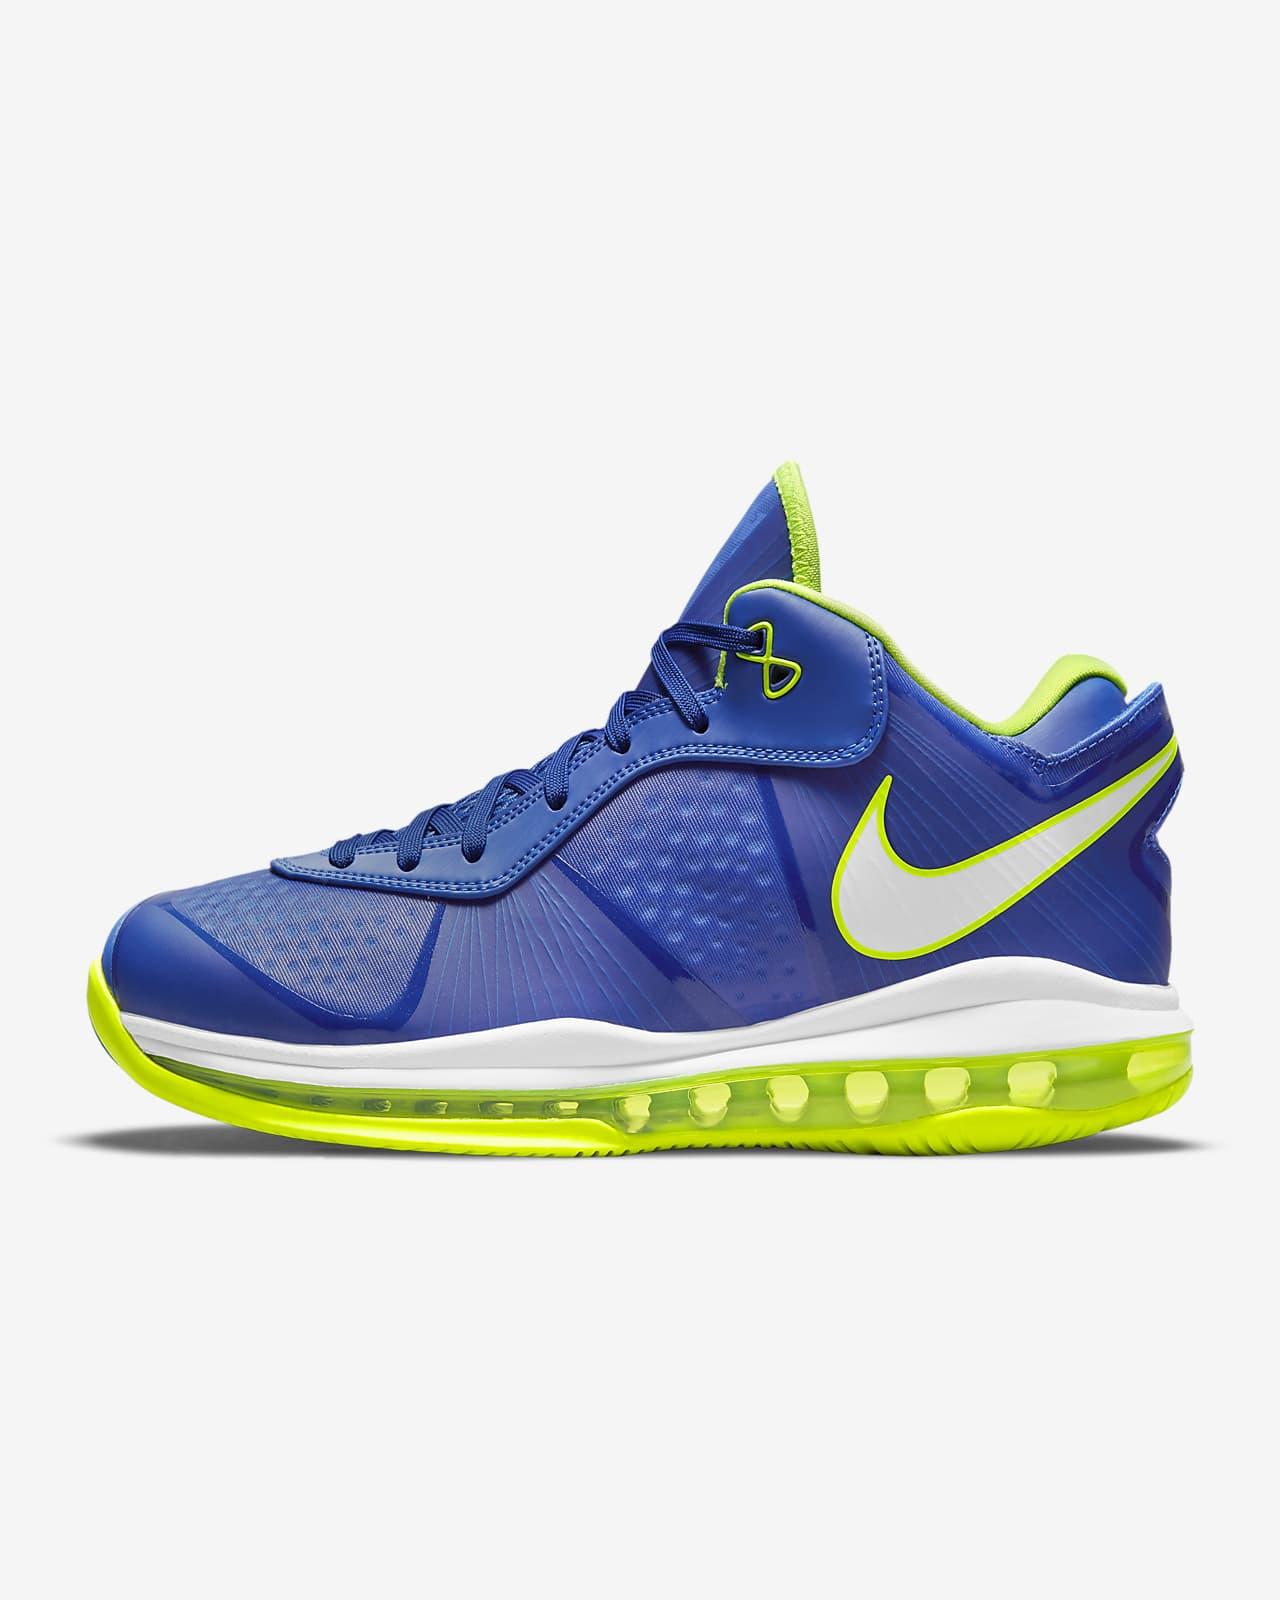 Nike LeBron 8 V/2 Low 'Treasure Blue' Schoen